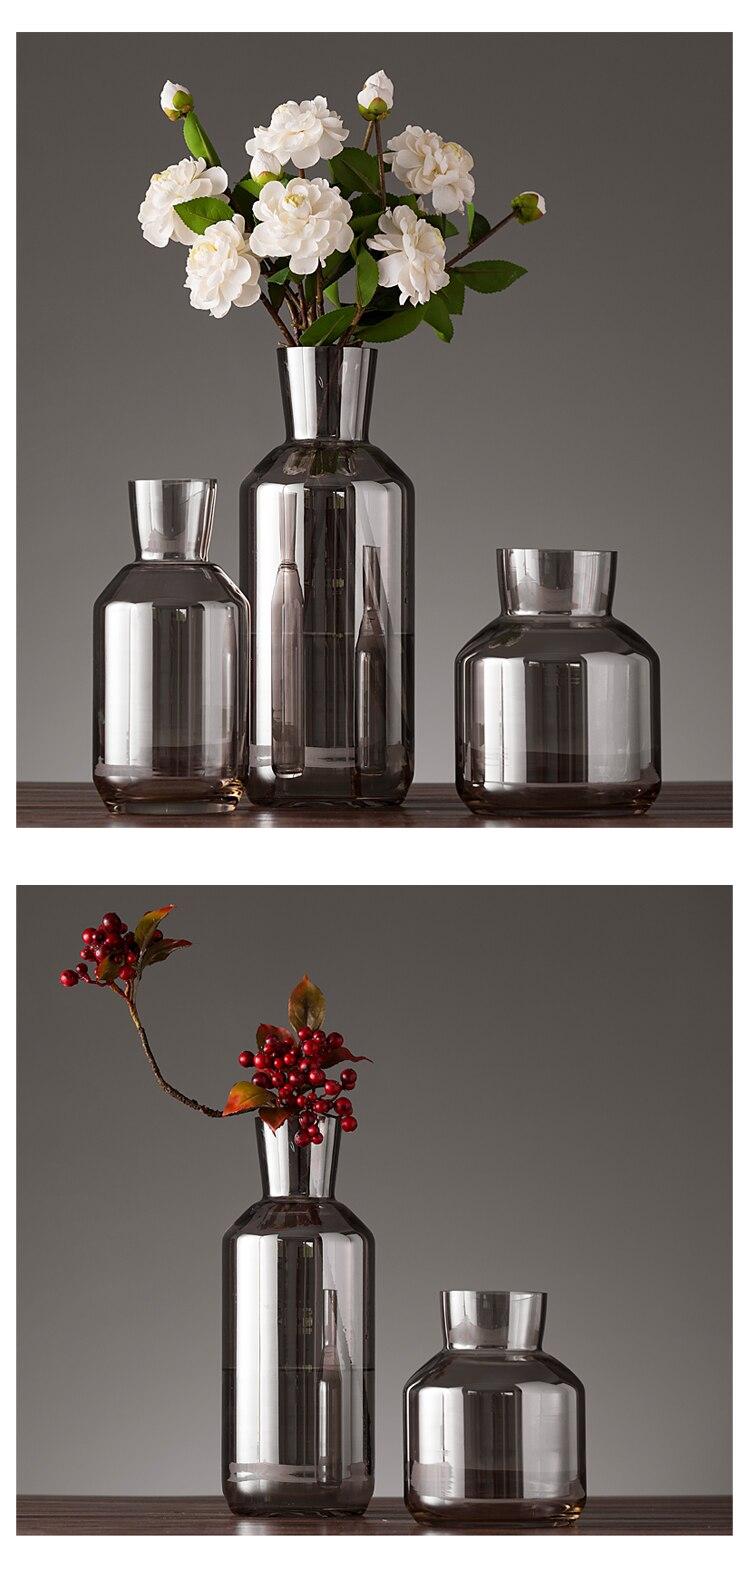 Nordic Creative Transparent glass vase Home modern living room desktop decoration accessories Flower arrangement vase Hydroponic